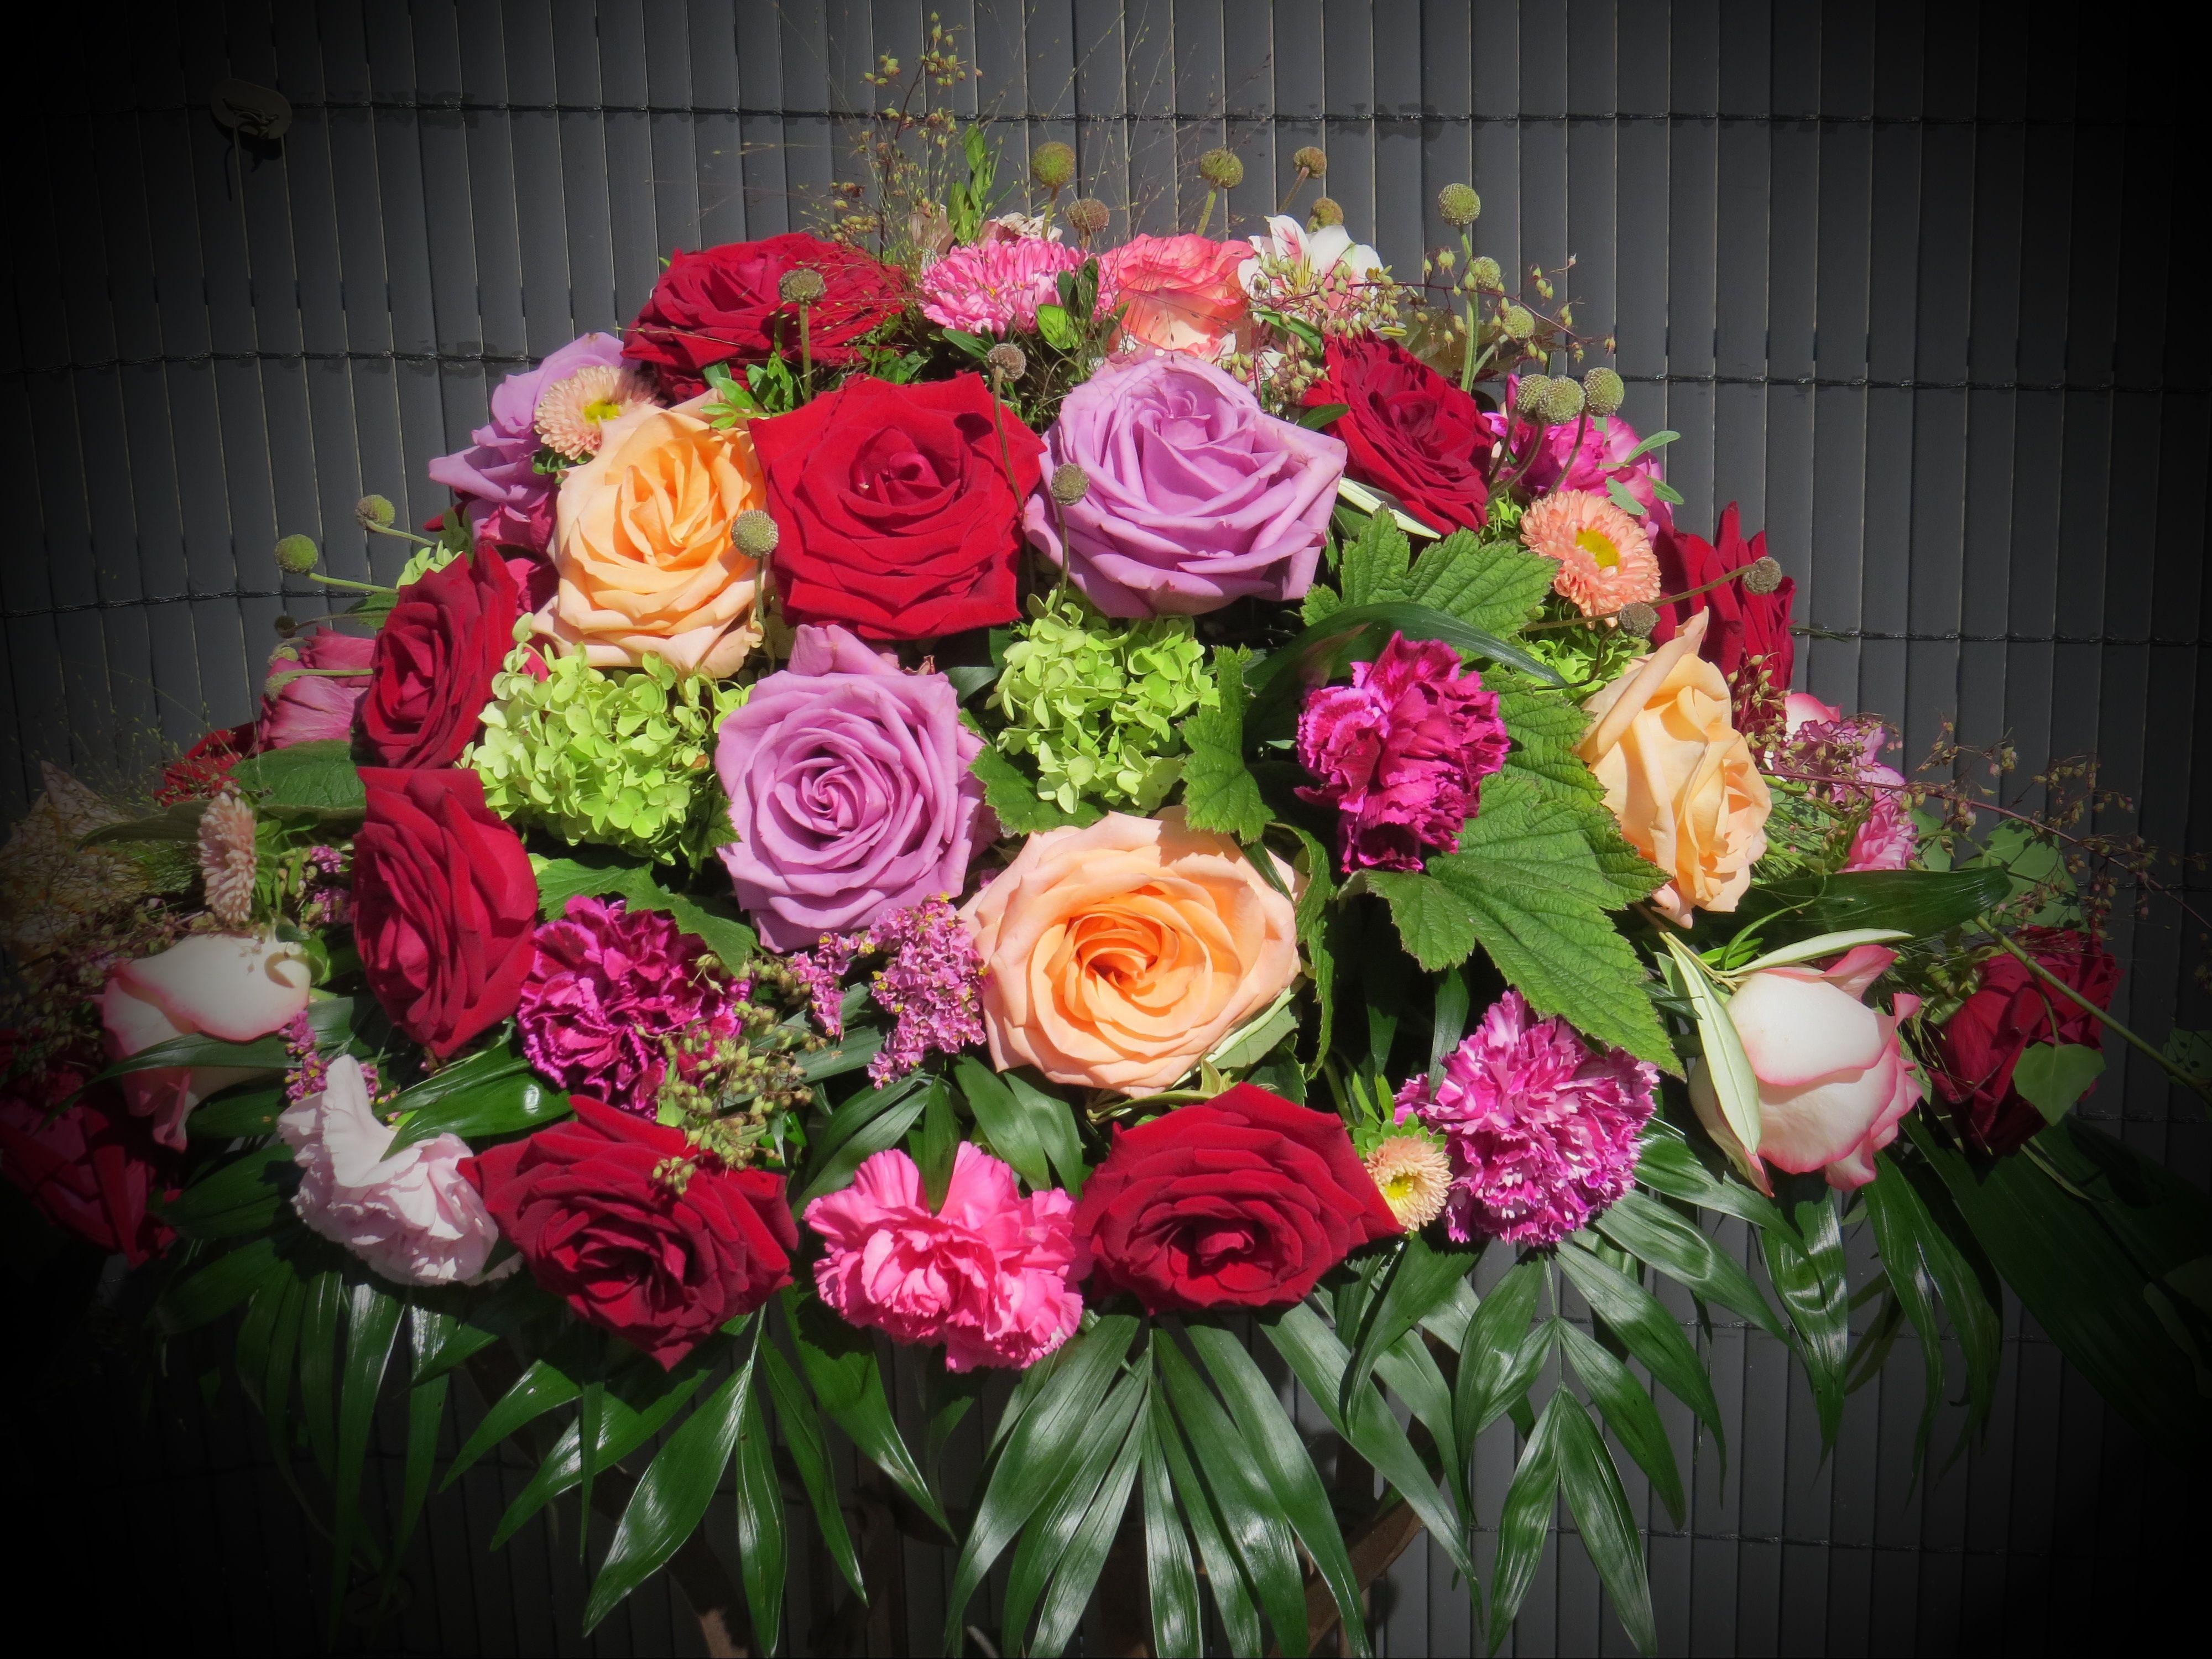 rosen in bordeaux aprico rosa lila und pink trauerfloristik pinterest bordeaux. Black Bedroom Furniture Sets. Home Design Ideas